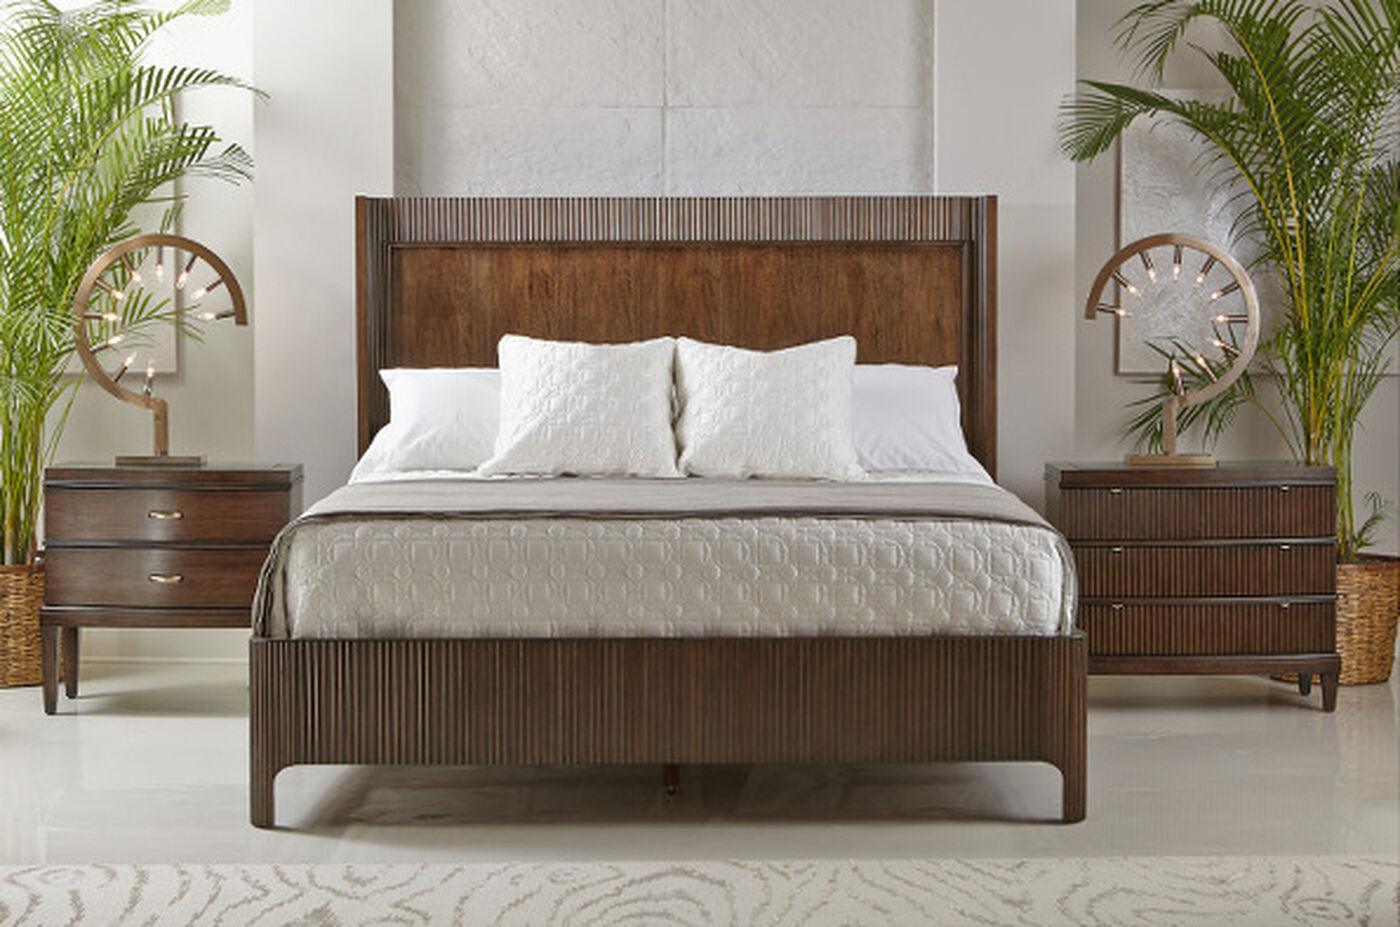 Bernhardt Beverly Glen Panel Bed | Mathis Brothers Furniture